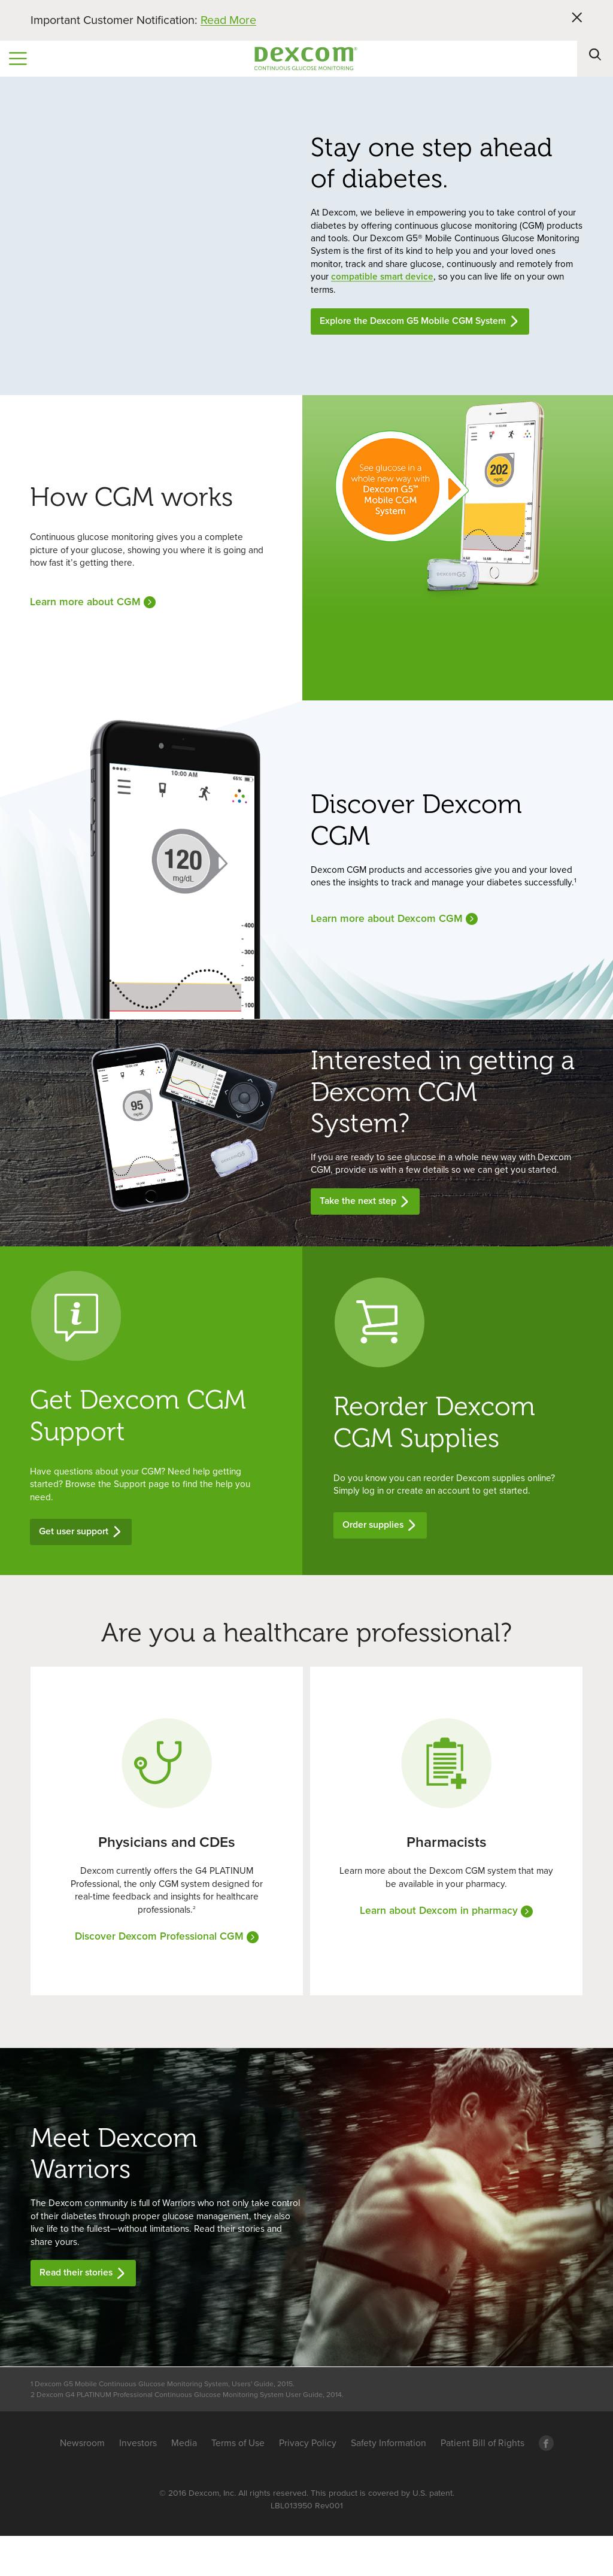 Dexcom Competitors, Revenue and Employees - Owler Company Profile